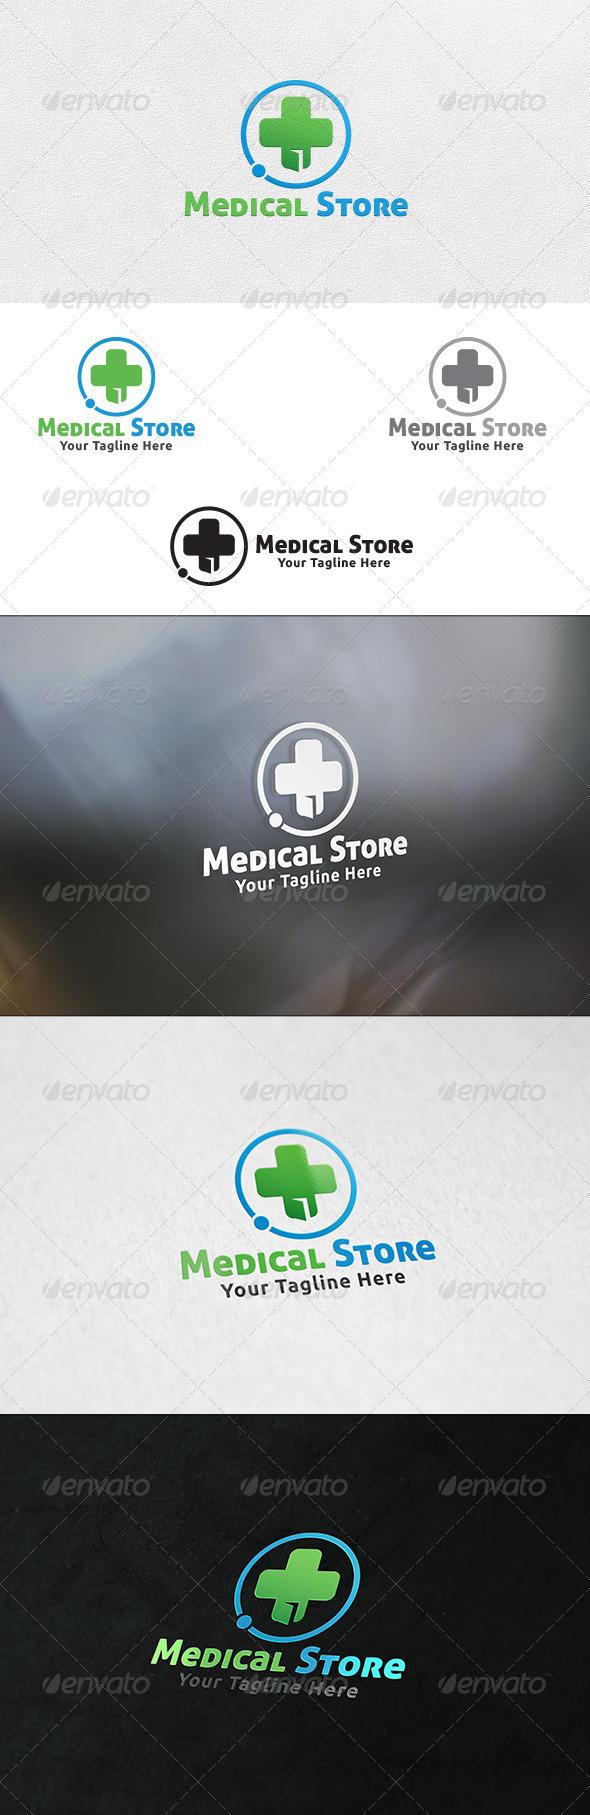 Medical Store - Logo Template - Buildings Logo Templates